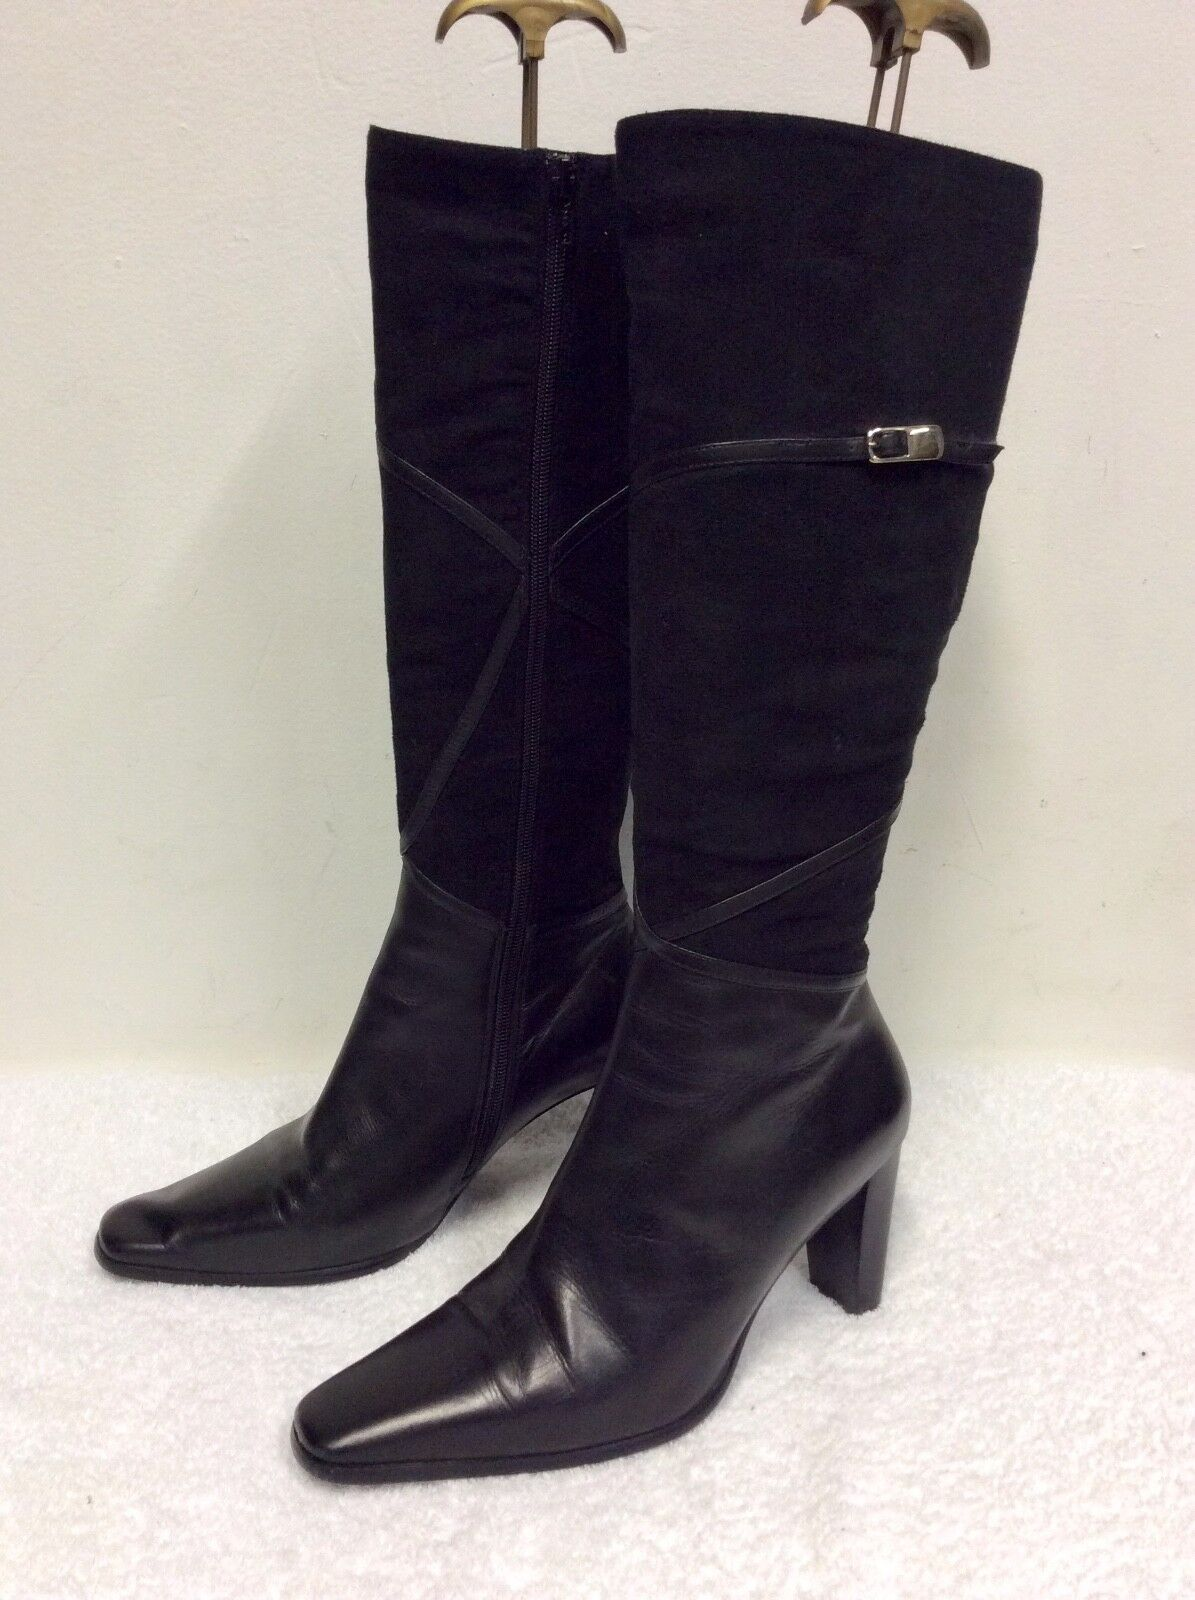 Roberto Vianni Negro Cuero rodilla Suede & la rodilla Cuero botas altas talla 5 38 38e524